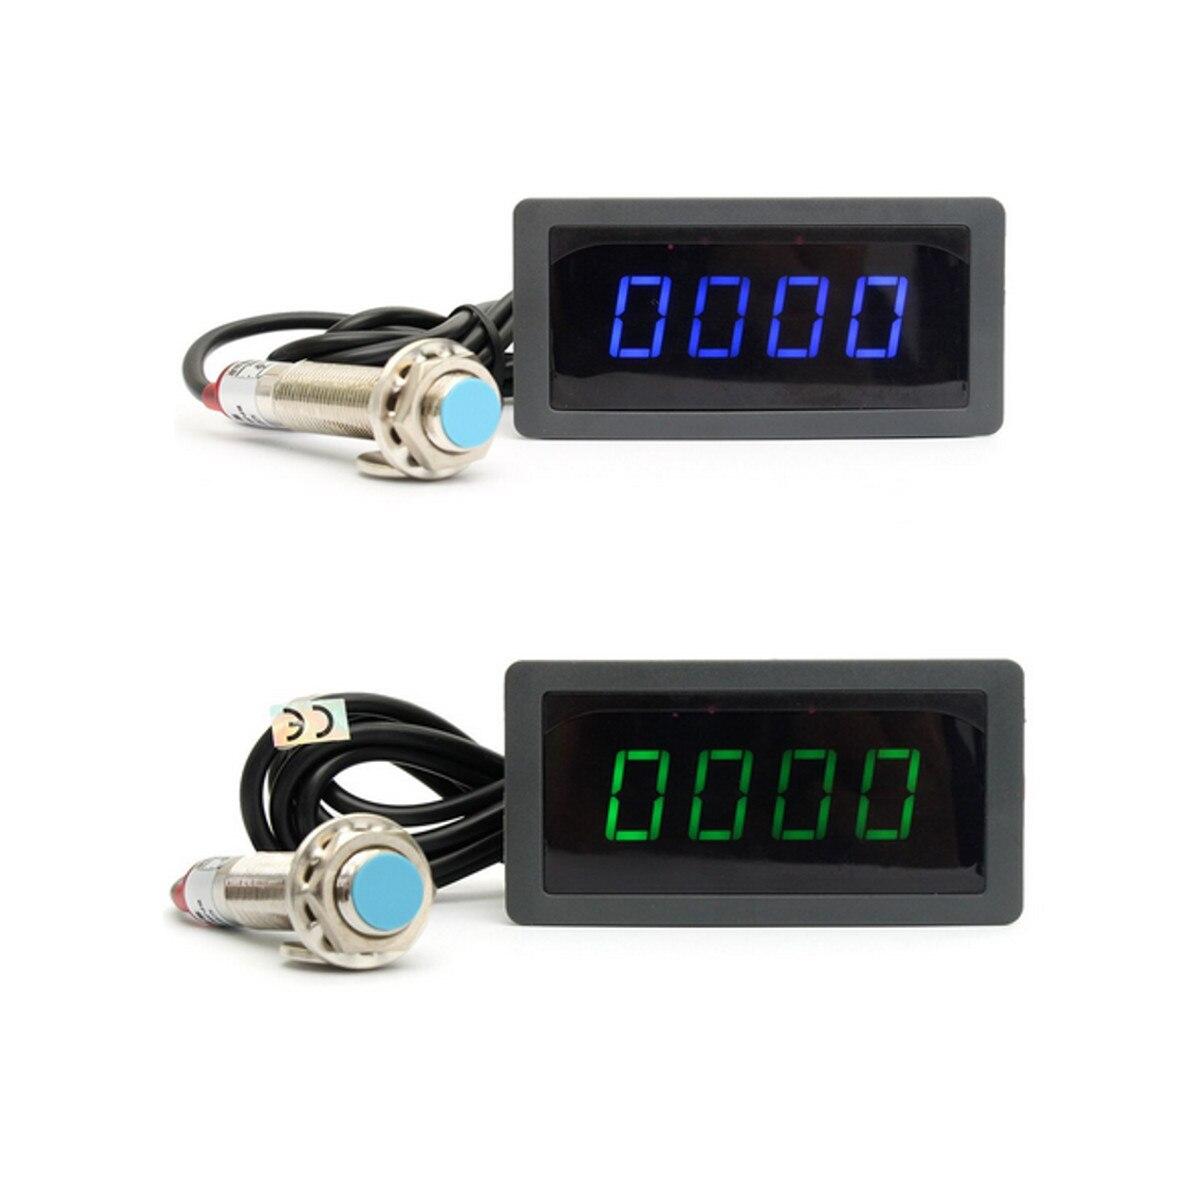 Blau Grün 4 Digital LED Drehzahlmesser RPM Geschwindigkeit Meter + Näherungsschalter Sensor 12 V Förderung